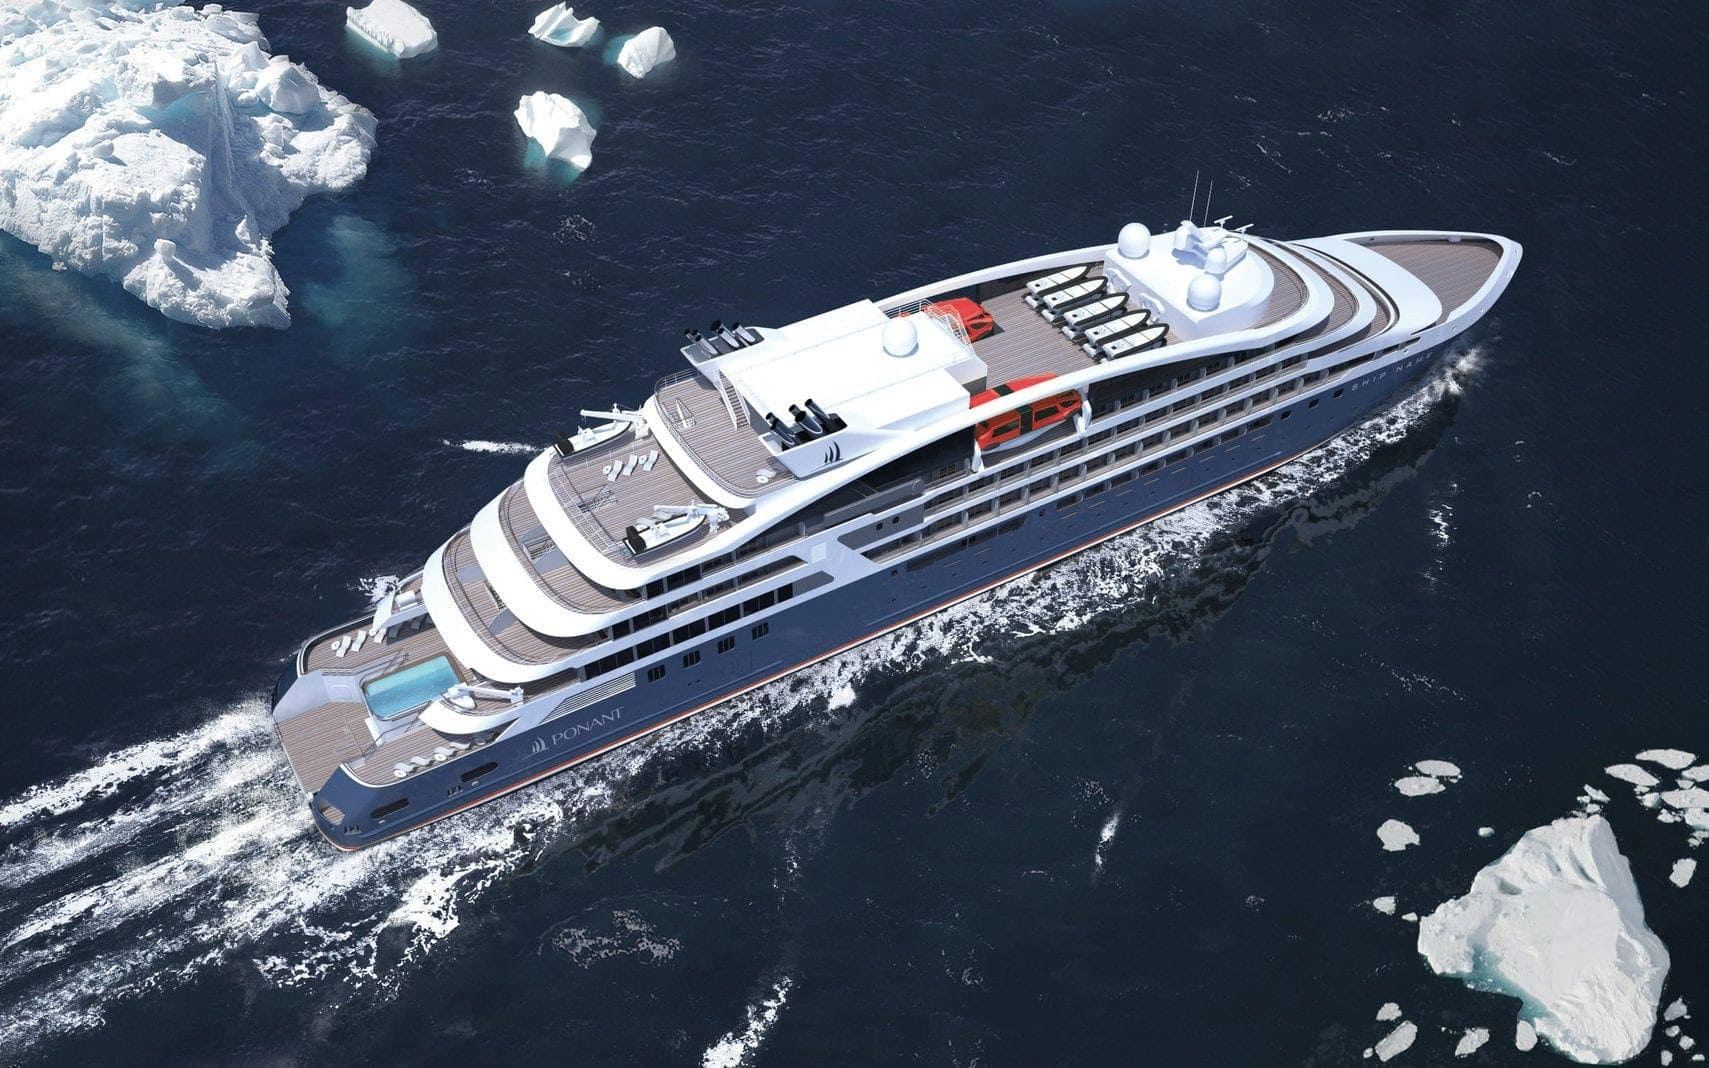 Kreuzfahrtschiff Le Bellot